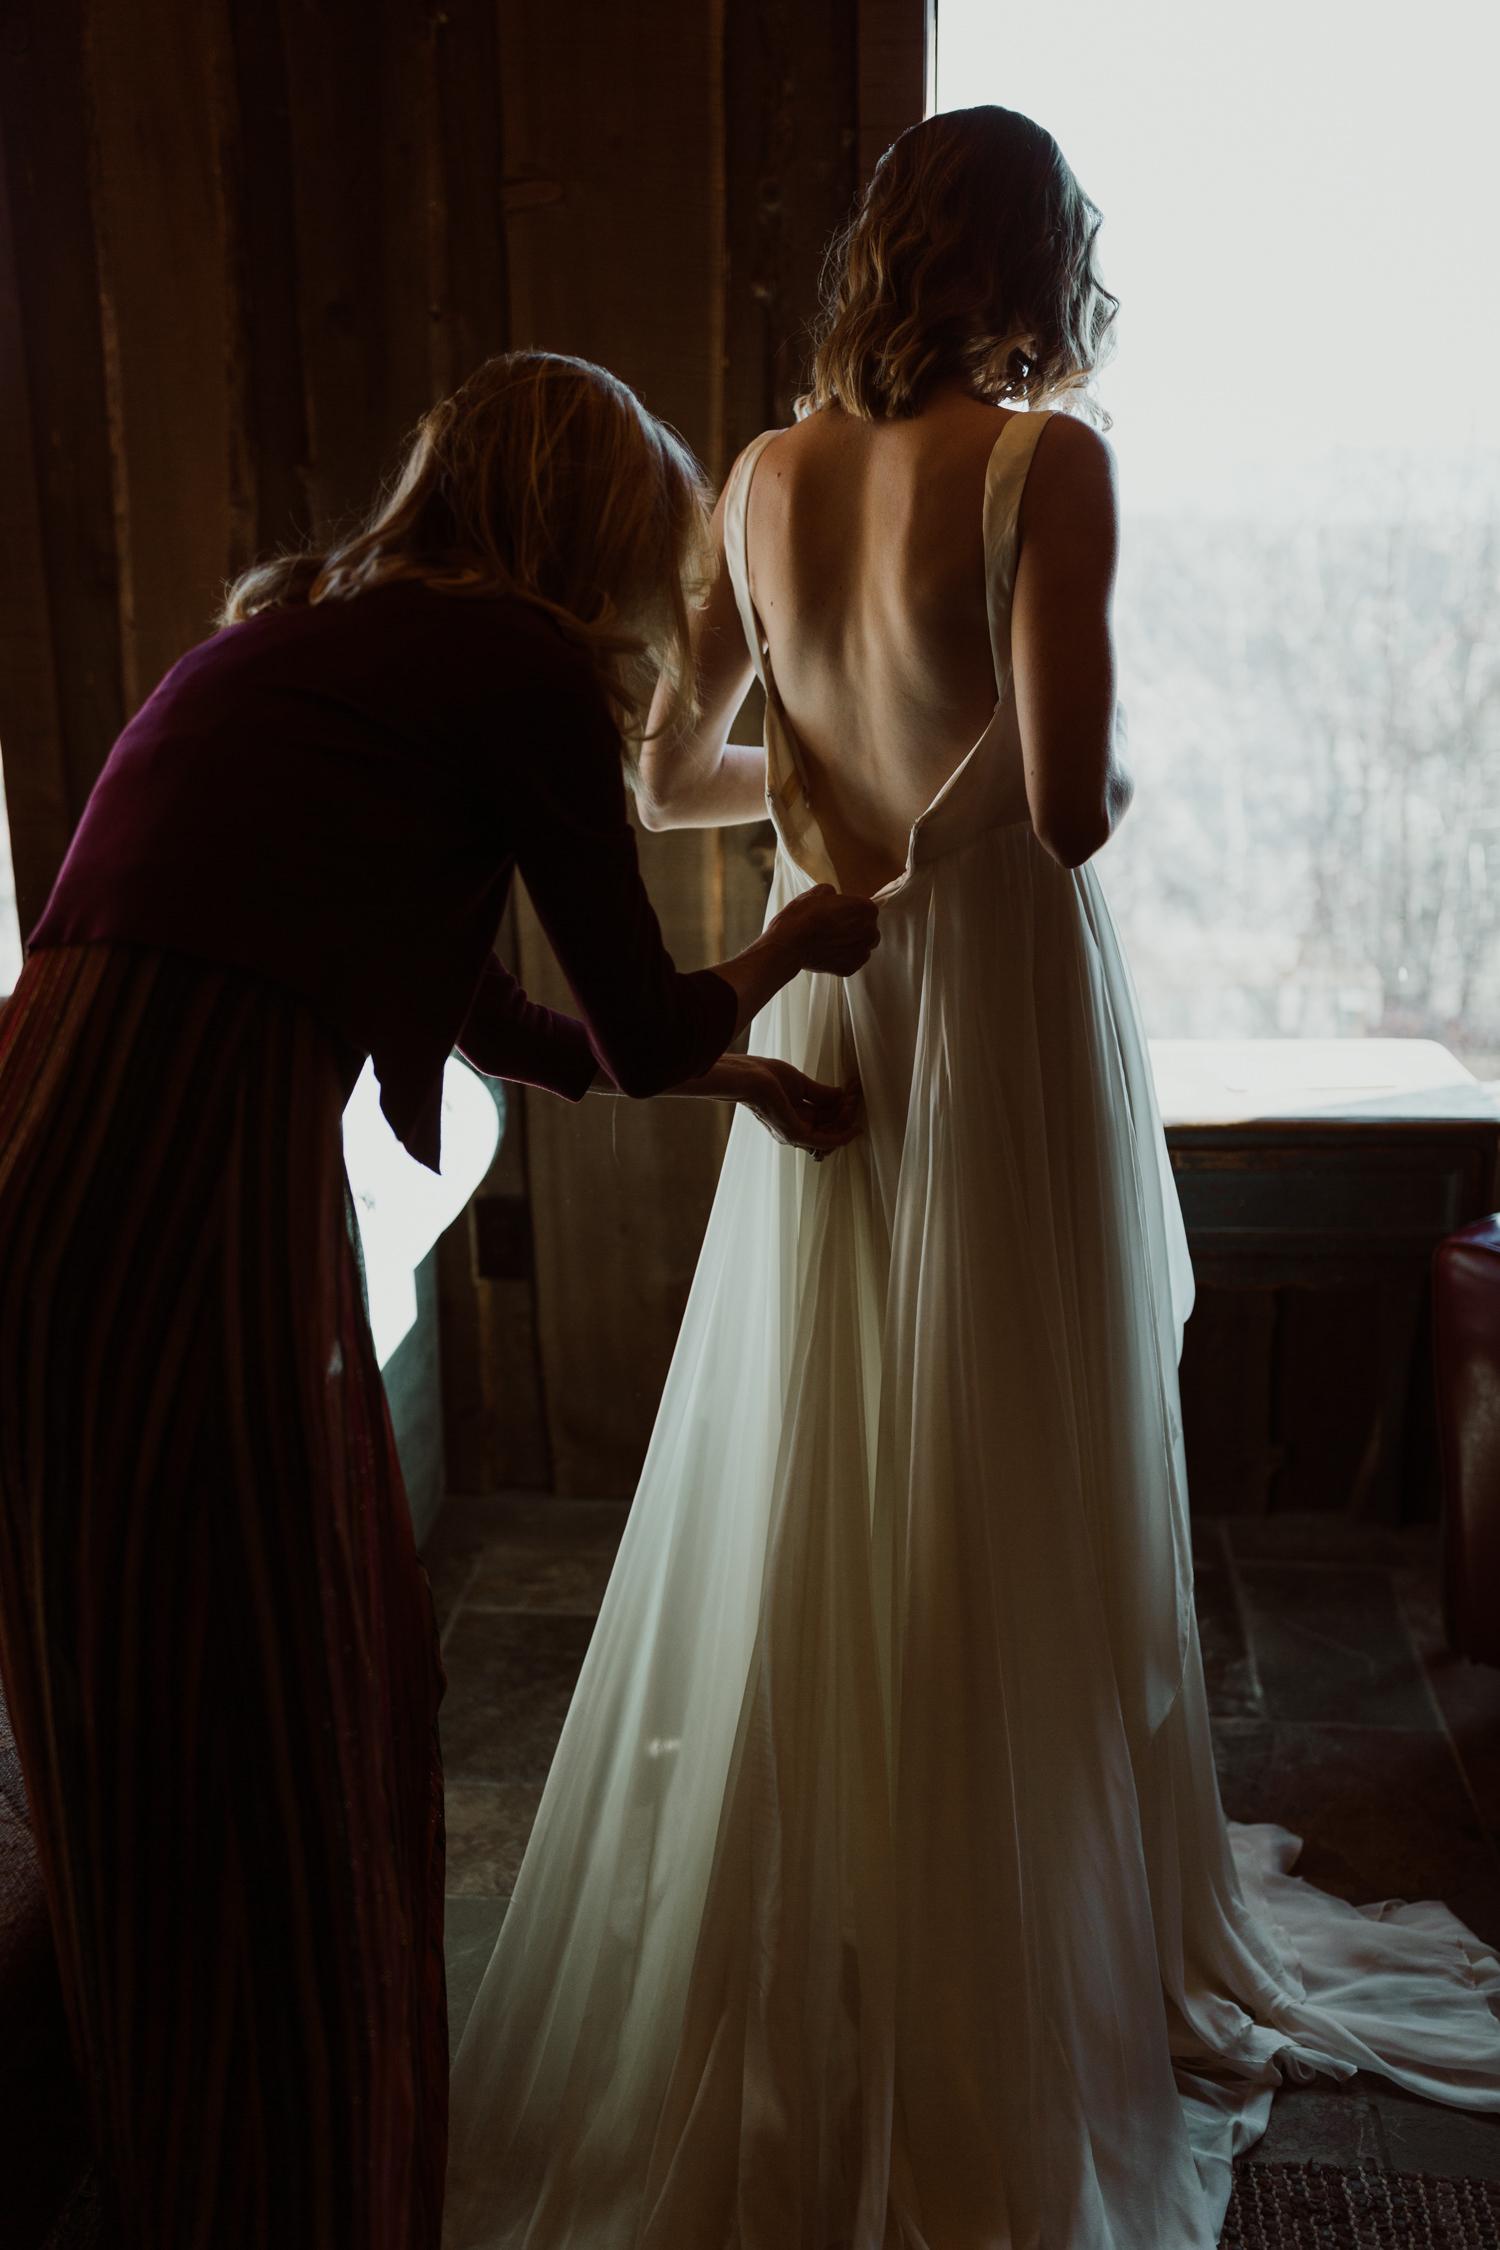 zion-national-park-wedding-65.jpg